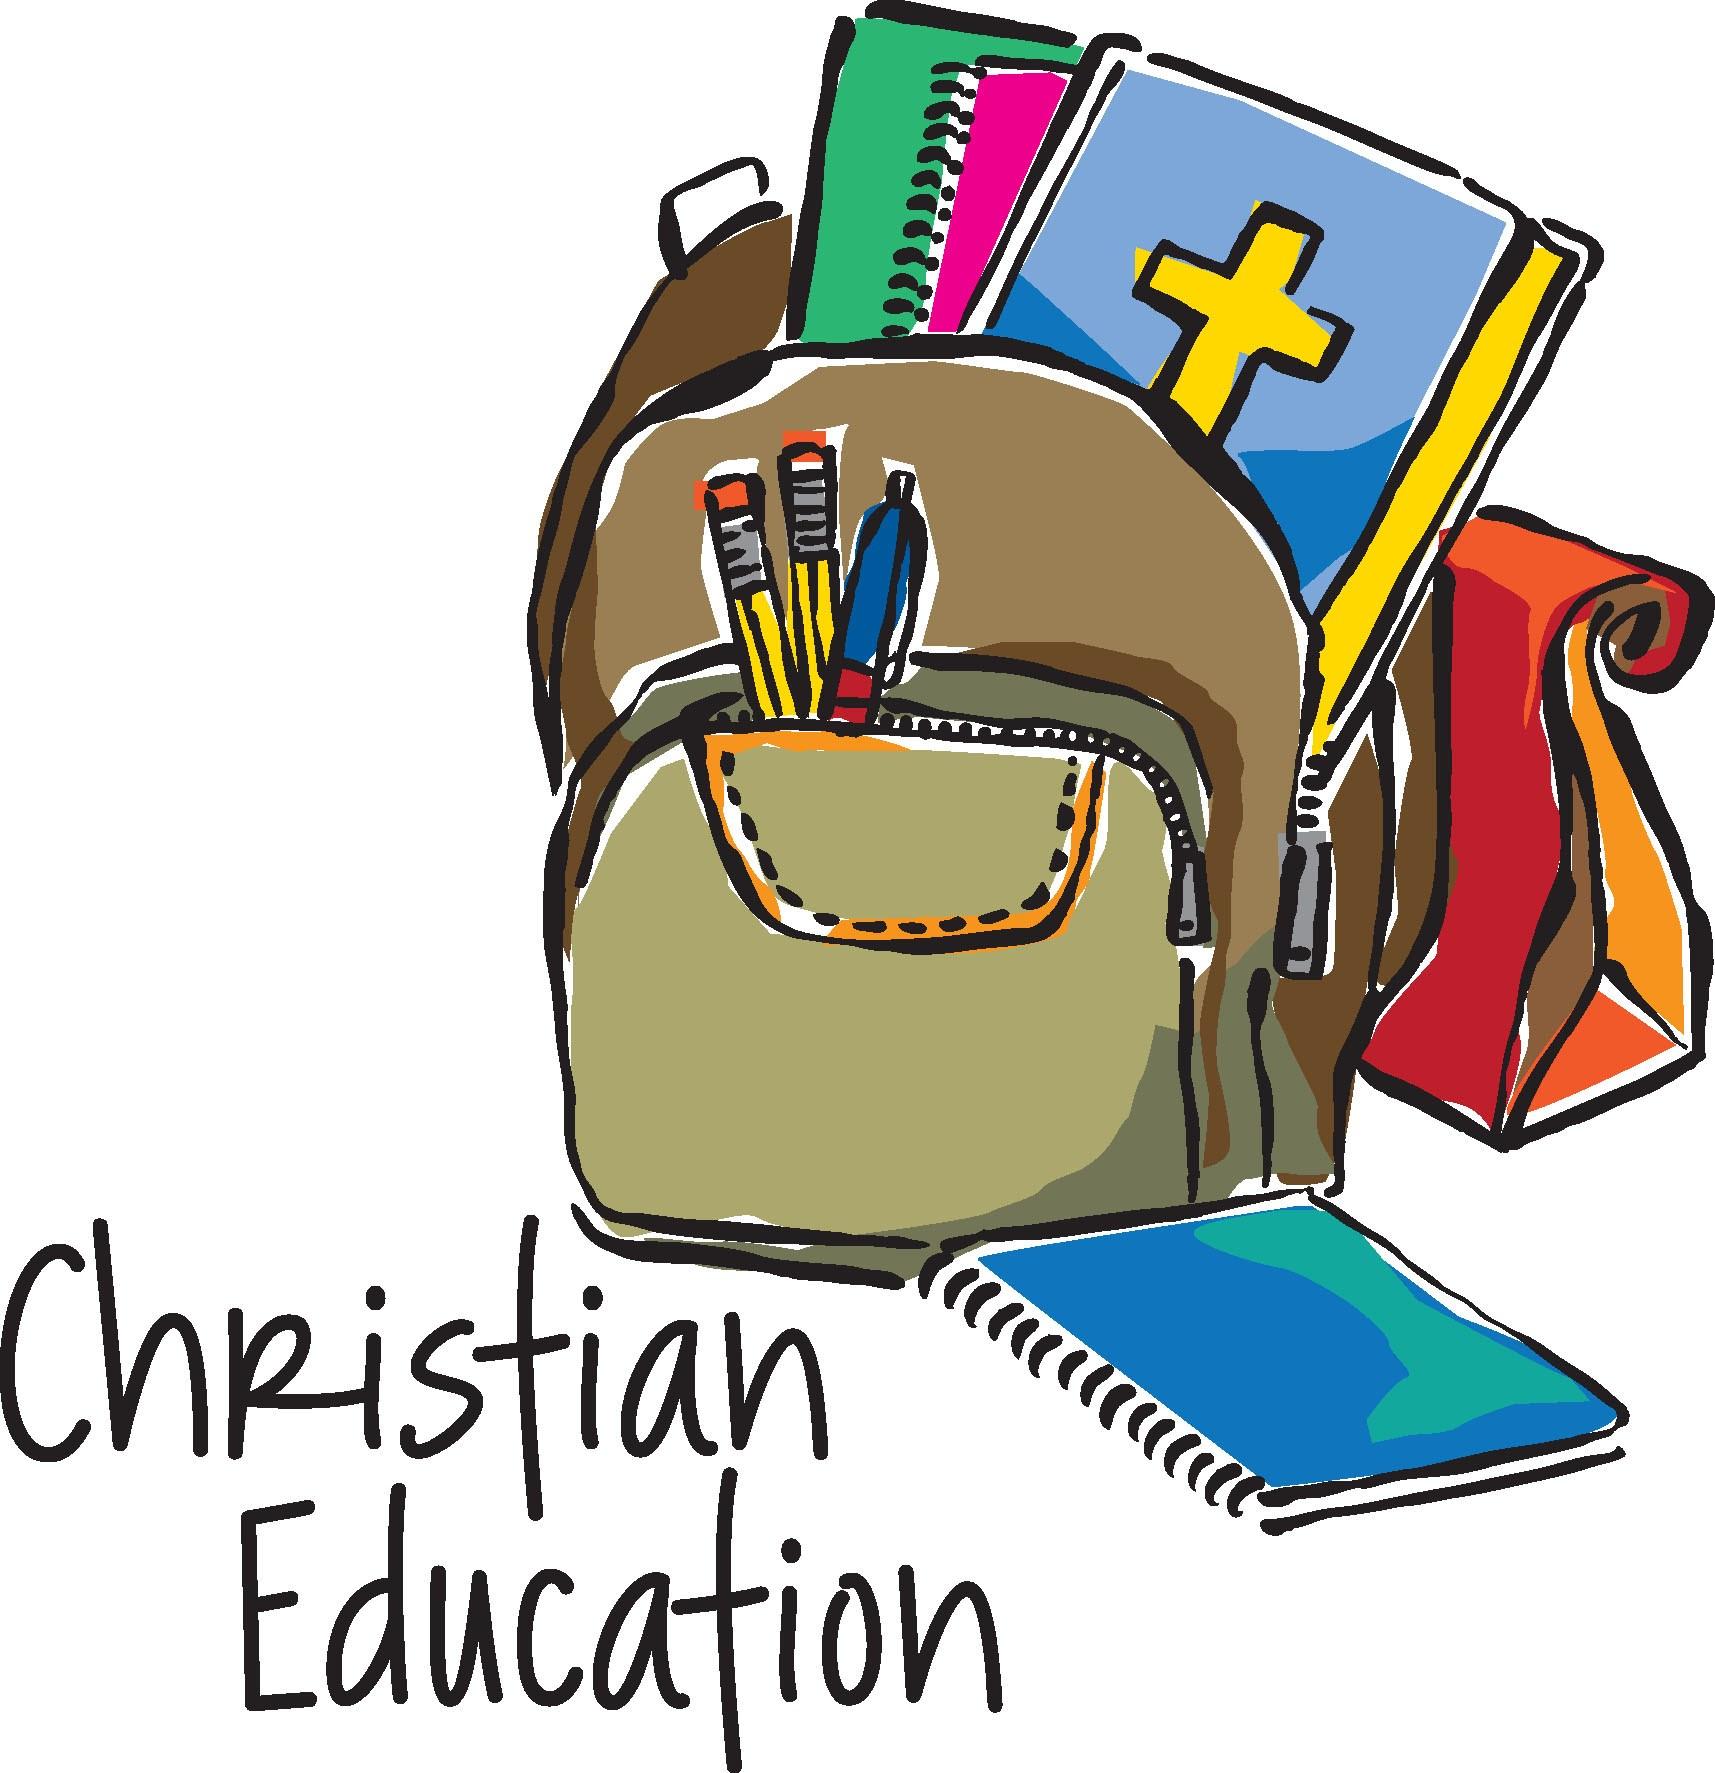 Christian education clipart 4 » Clipart Portal.